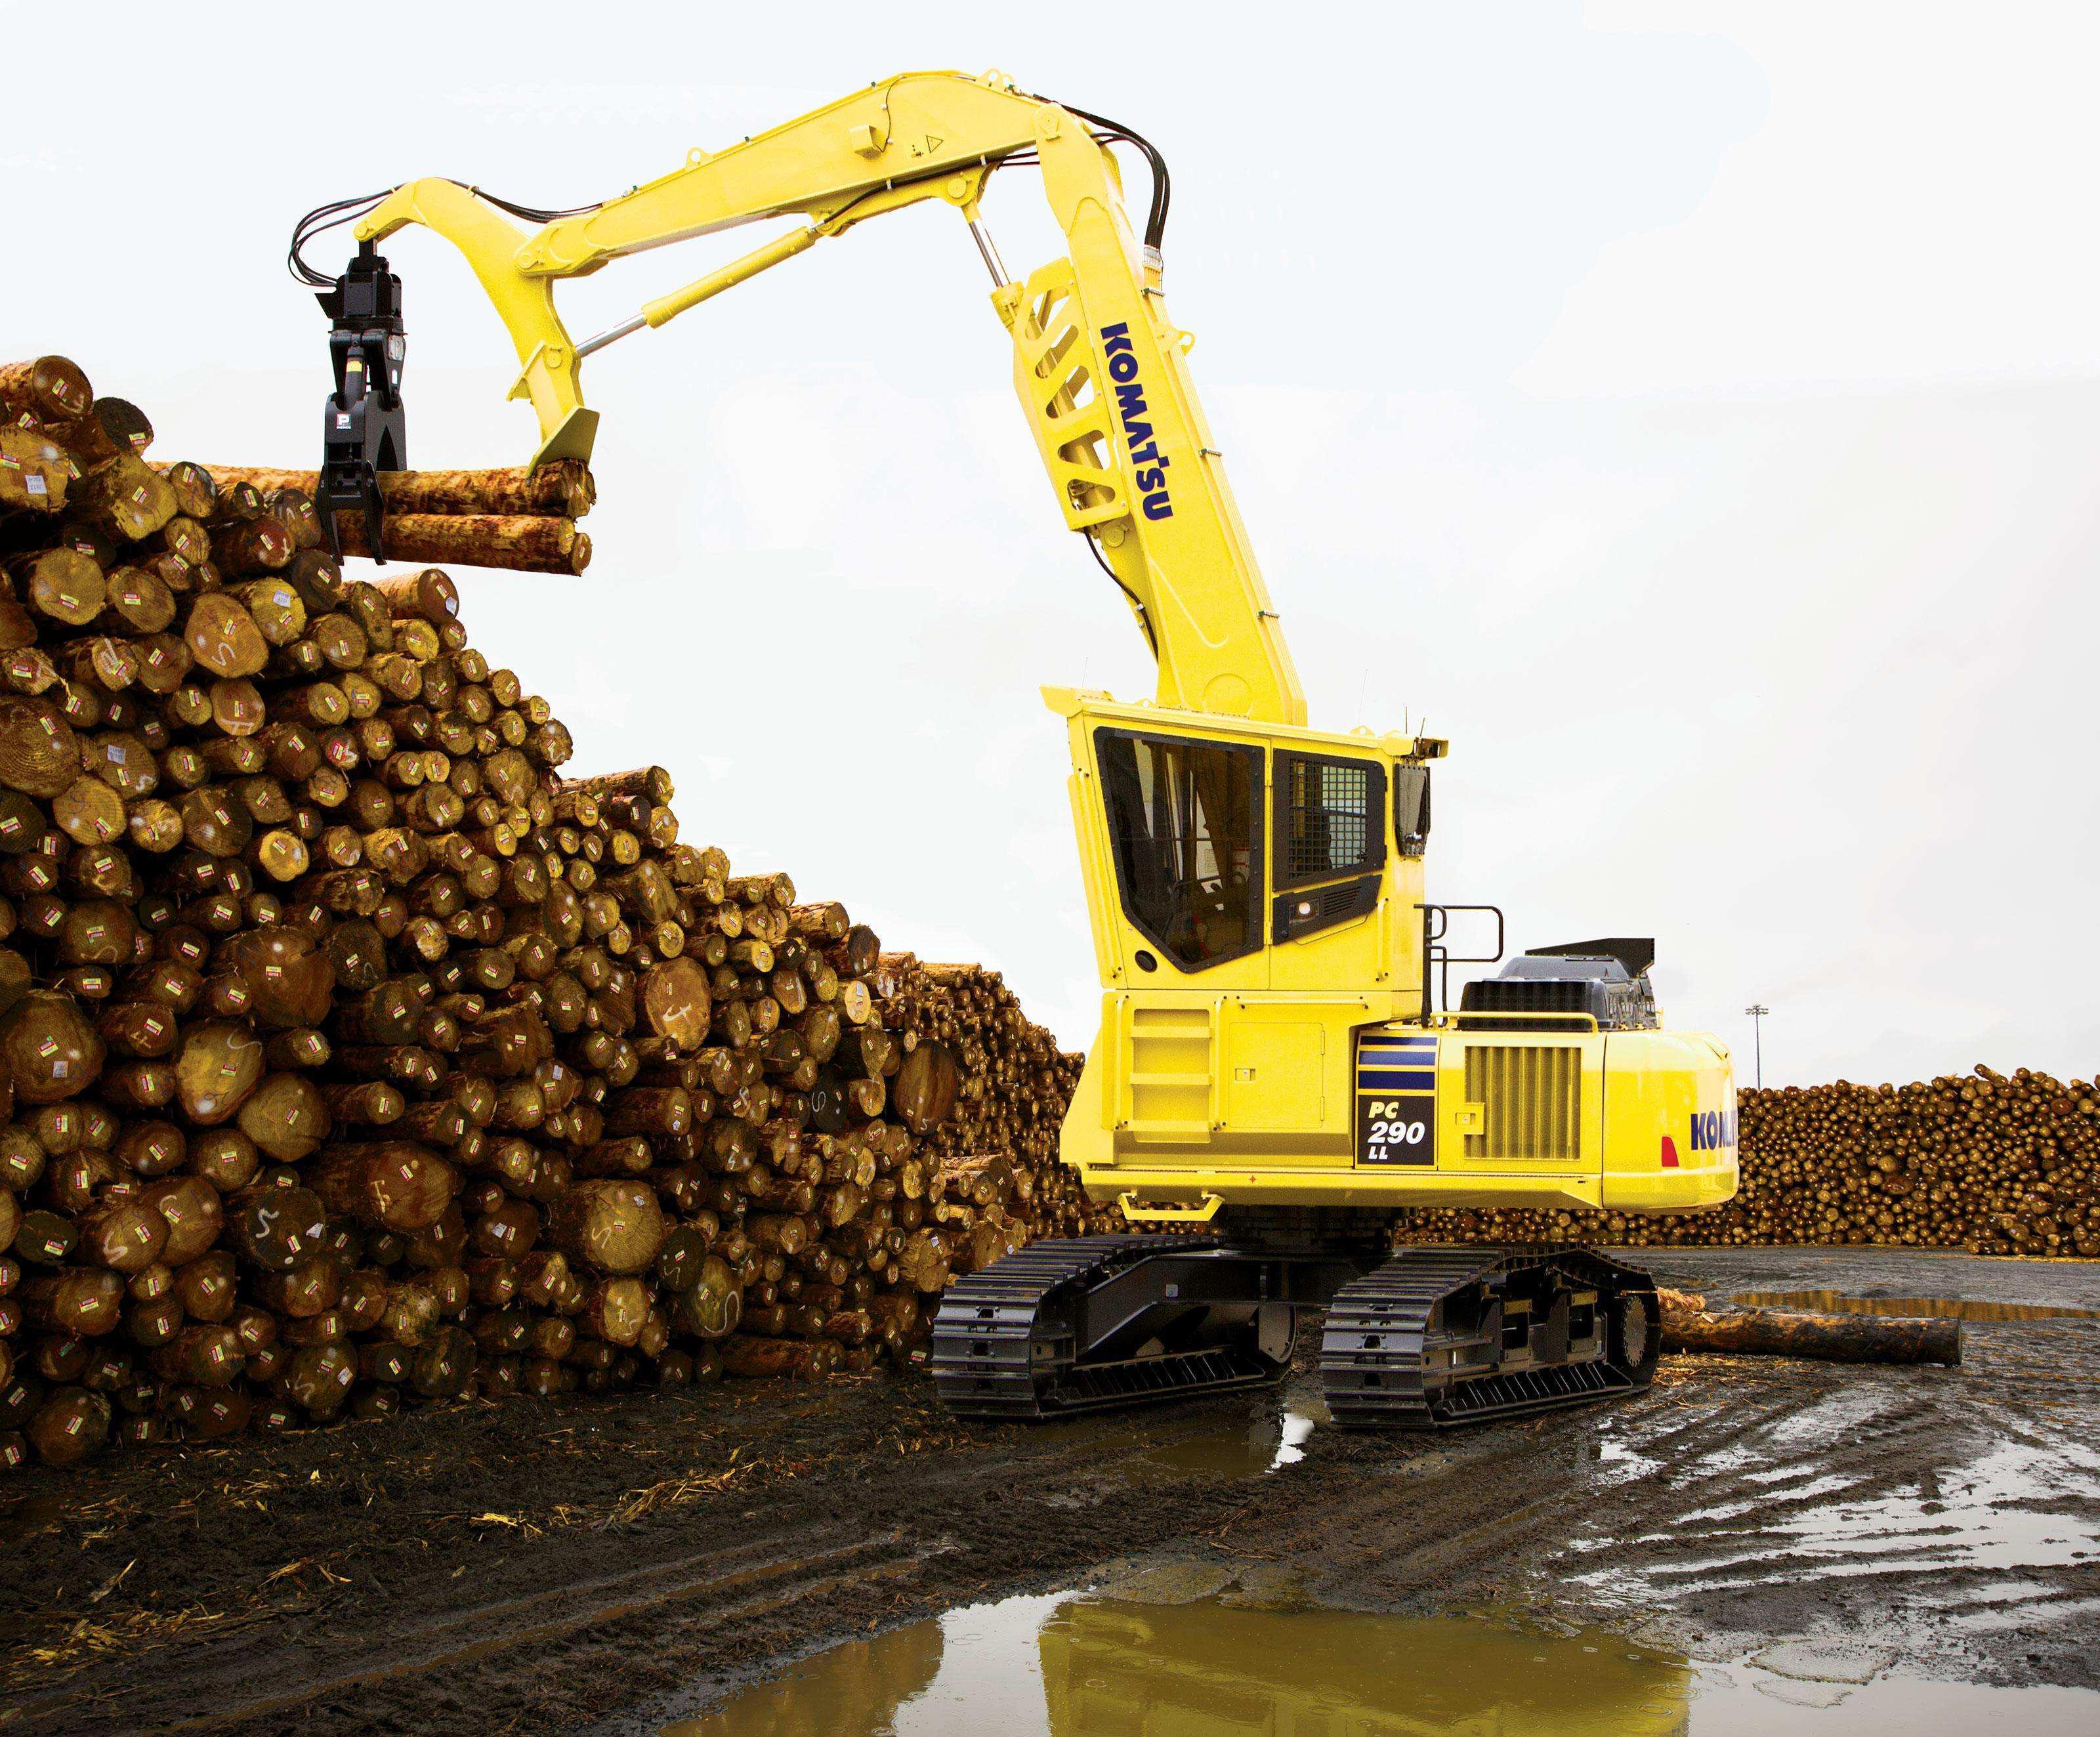 komatsu intros pc290ll 11 log loader road builder with new high